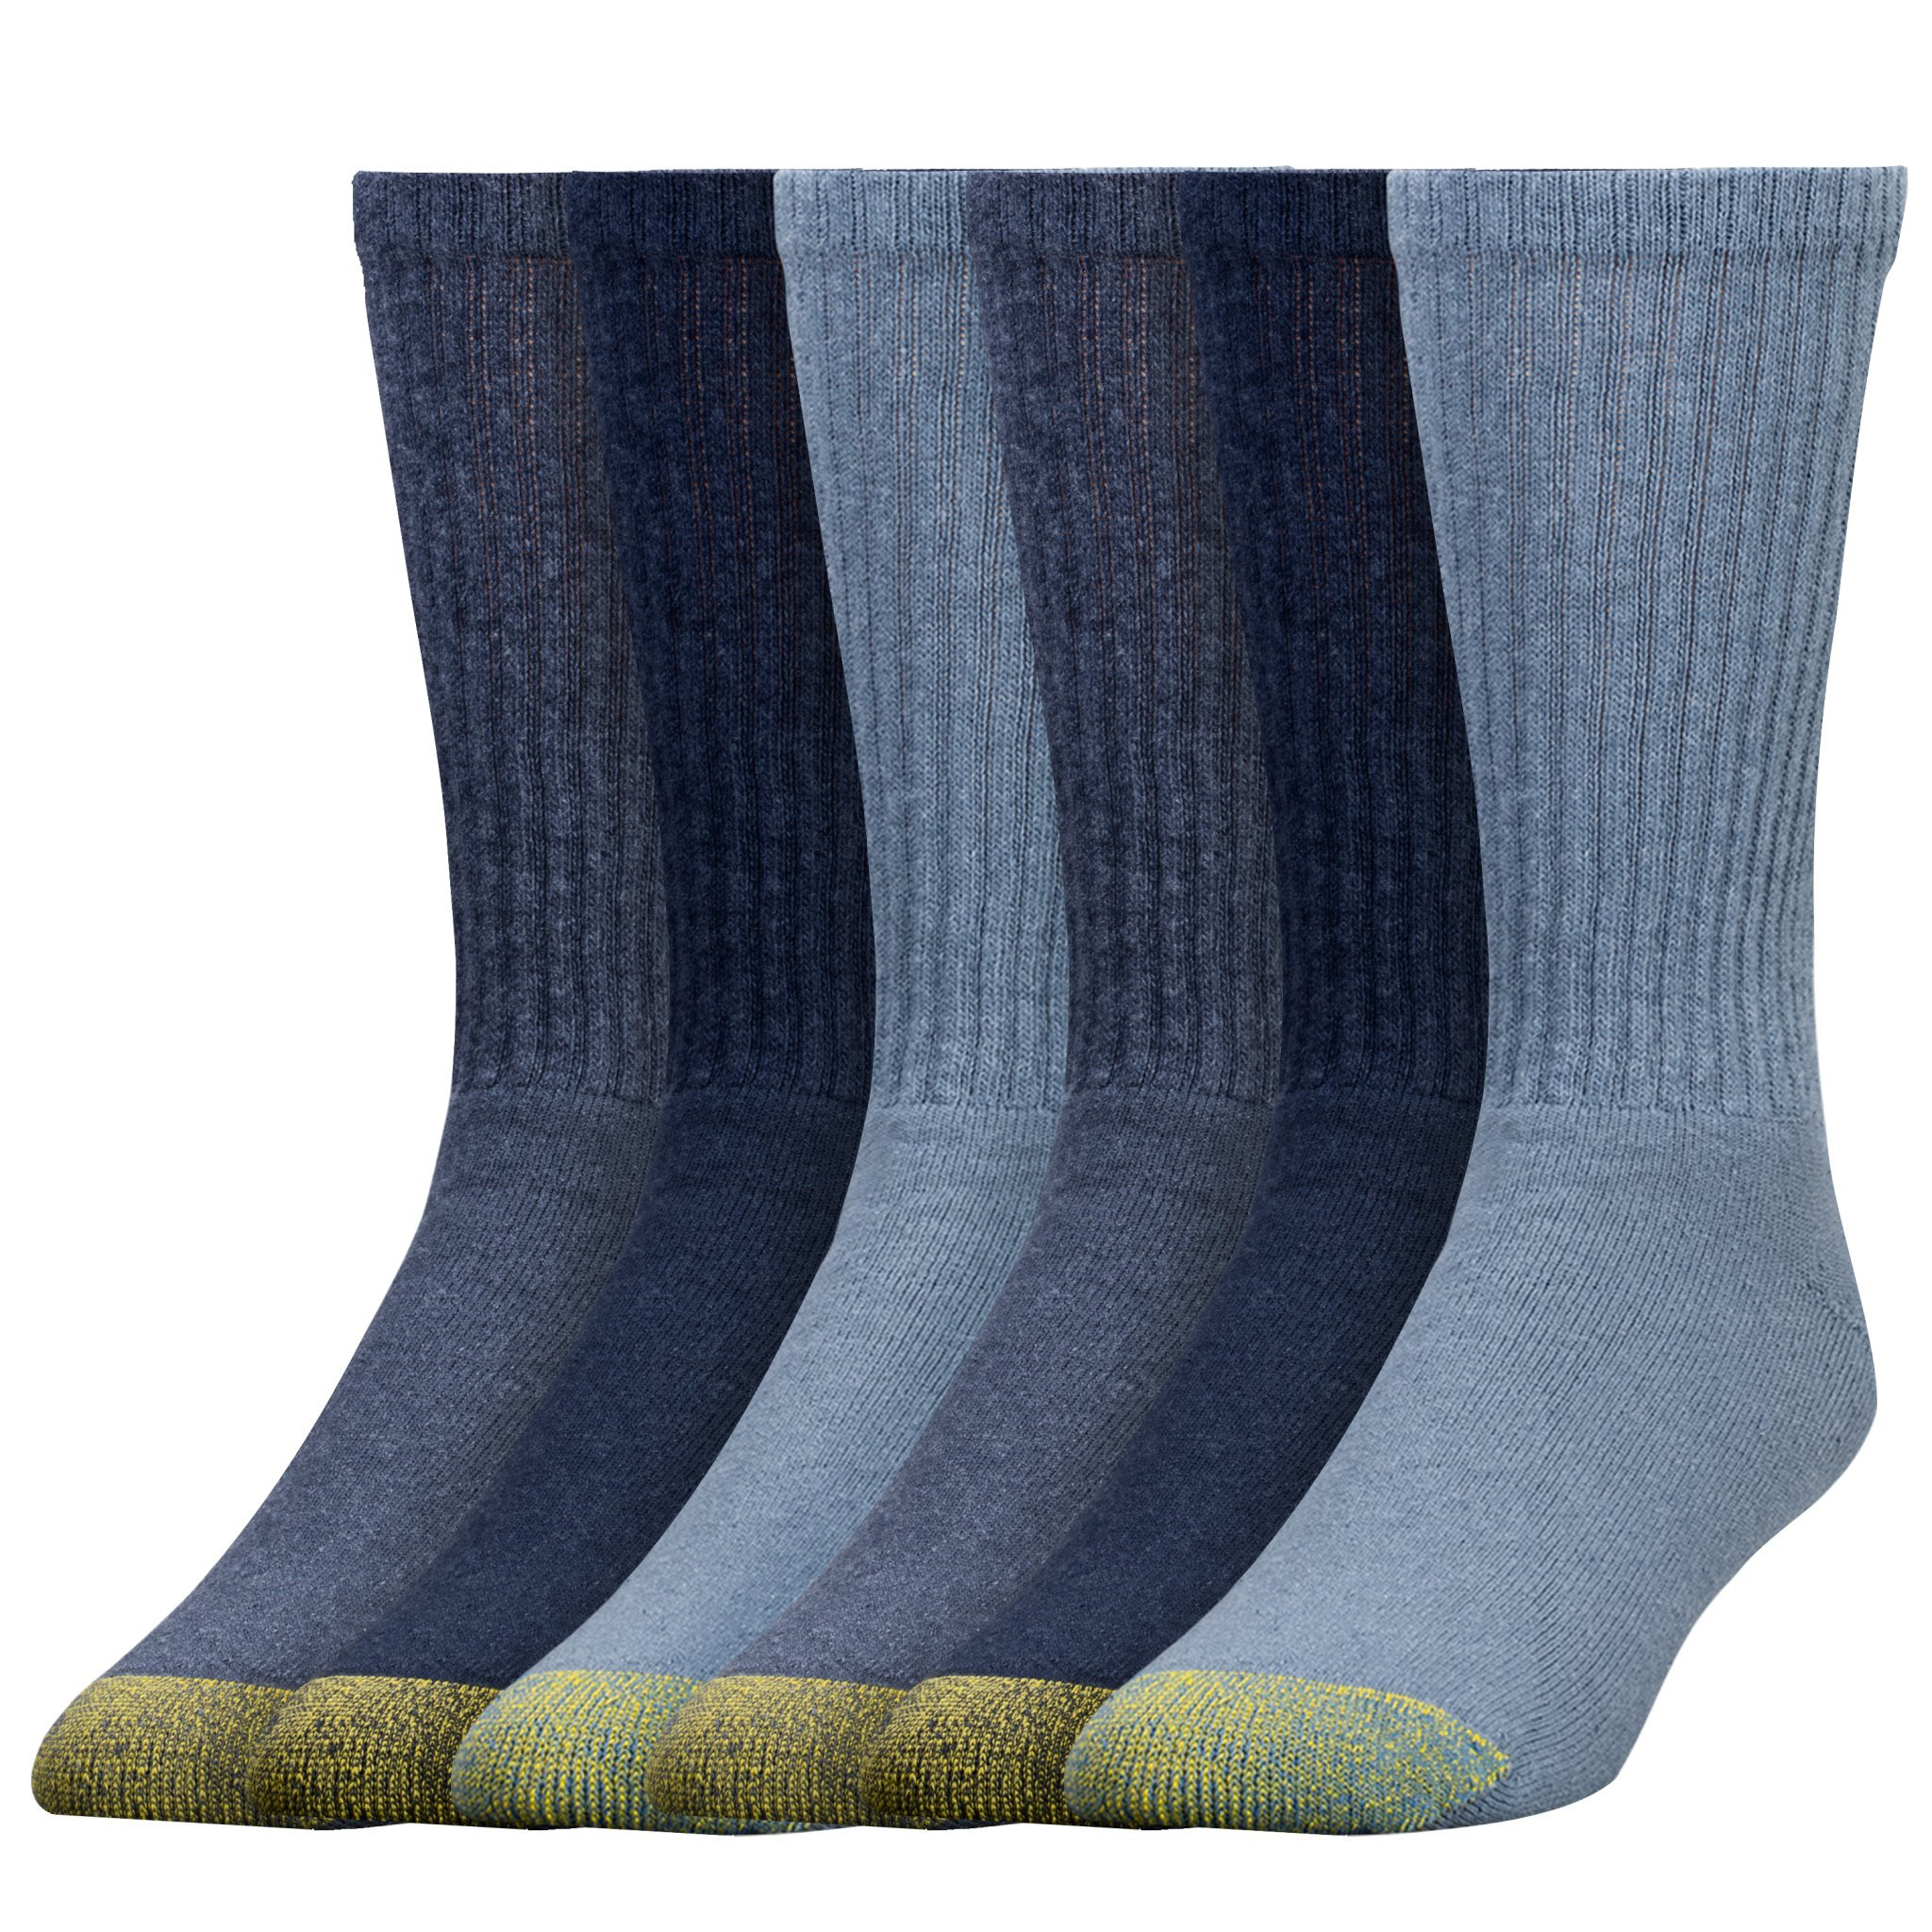 Gold Toe Men's 6-Pack Cotton Crew Athletic Sock, Assorted Blues, 10-13 (Shoe Size 6-12.5)